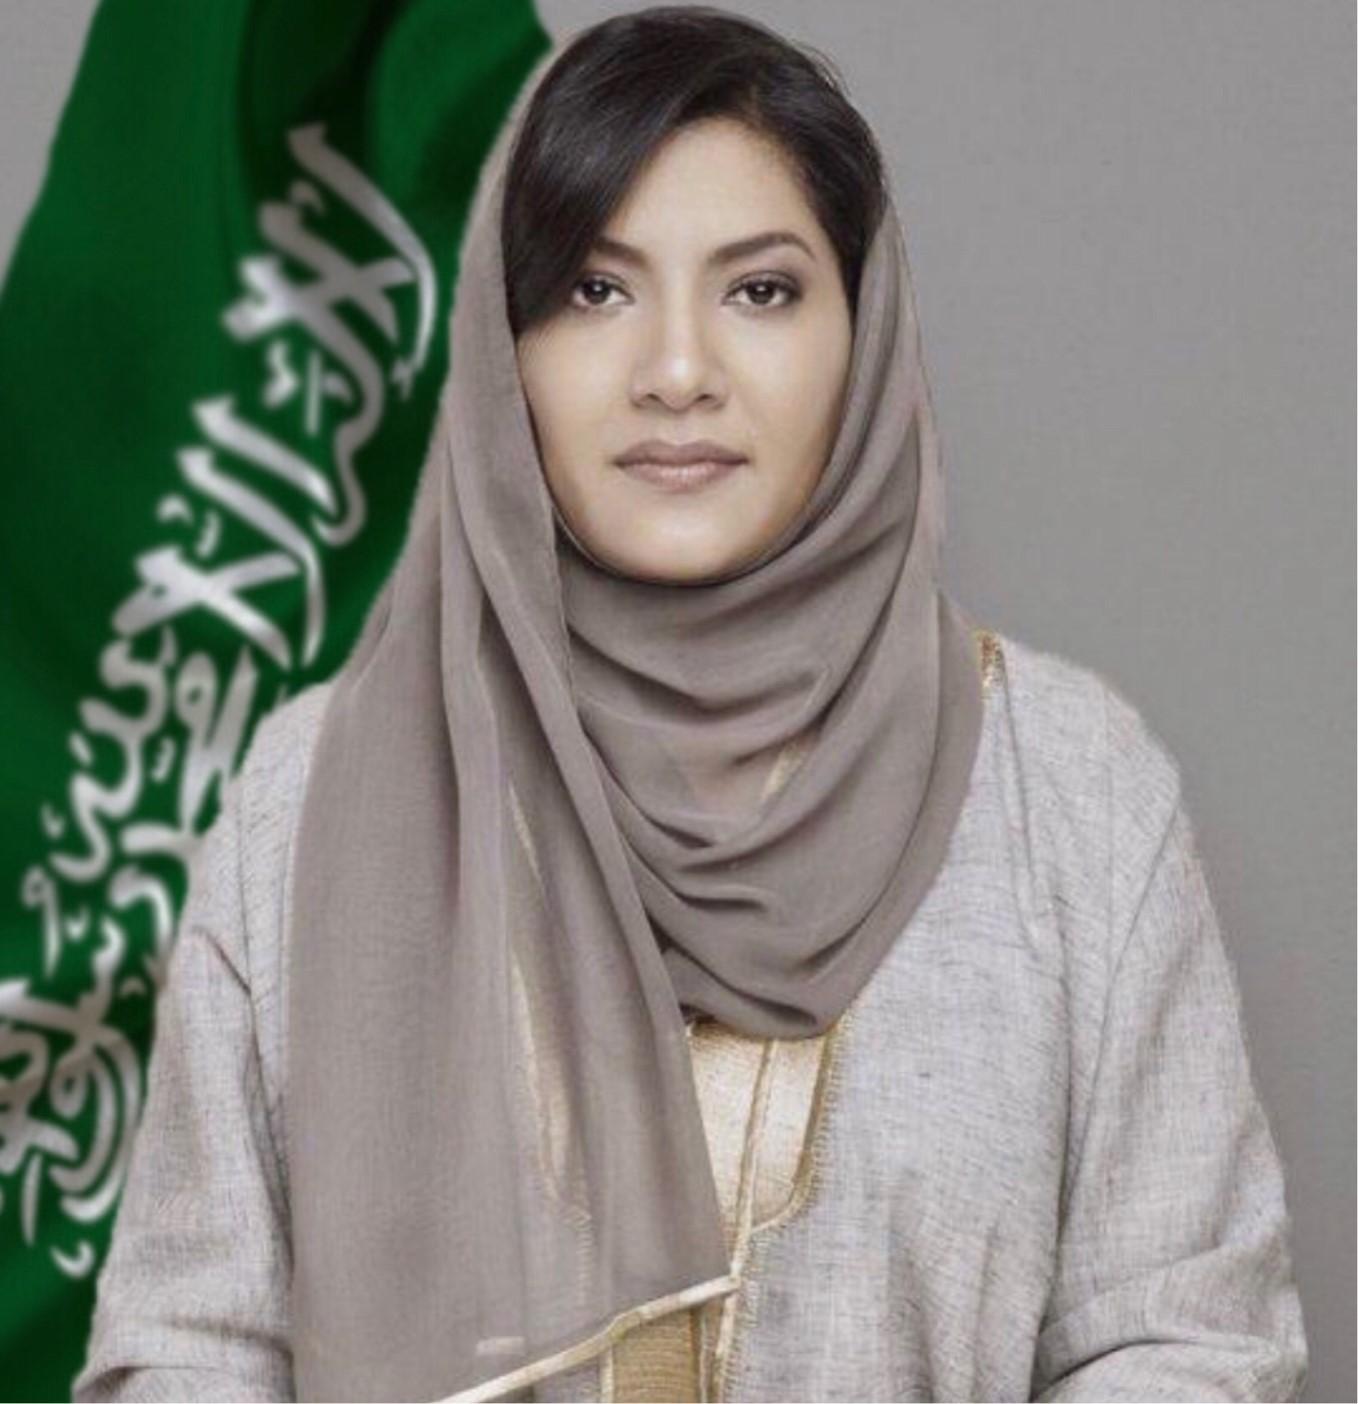 The Ambassador | The Embassy of The Kingdom of Saudi Arabia